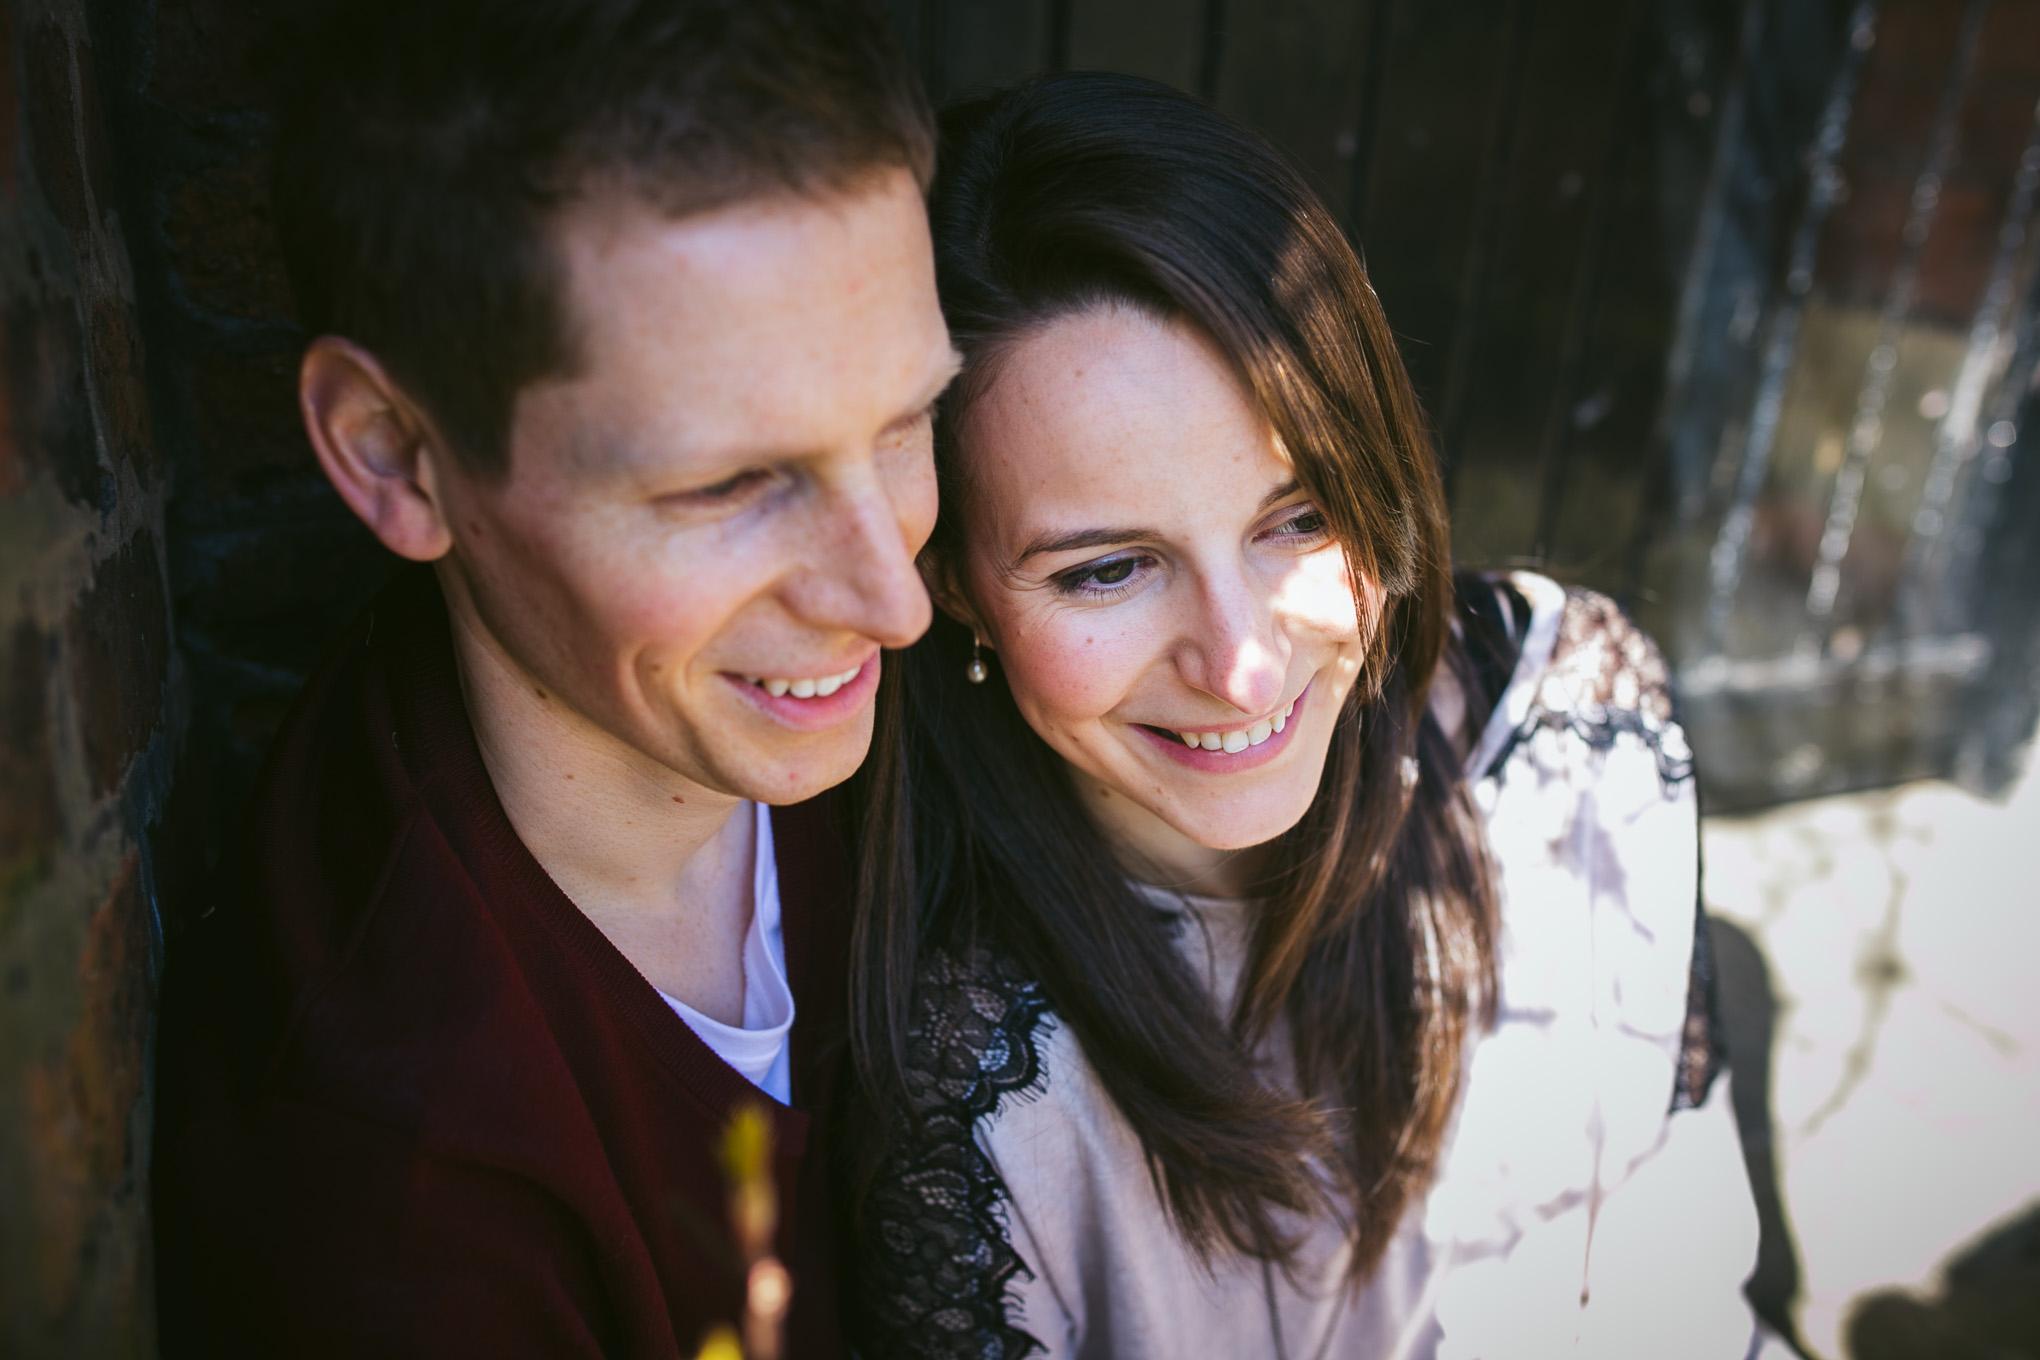 SophieandChris-Pre-Wedding-at-fletcher-moss-park-Didsbury-tom-biddle-tb69.jpg